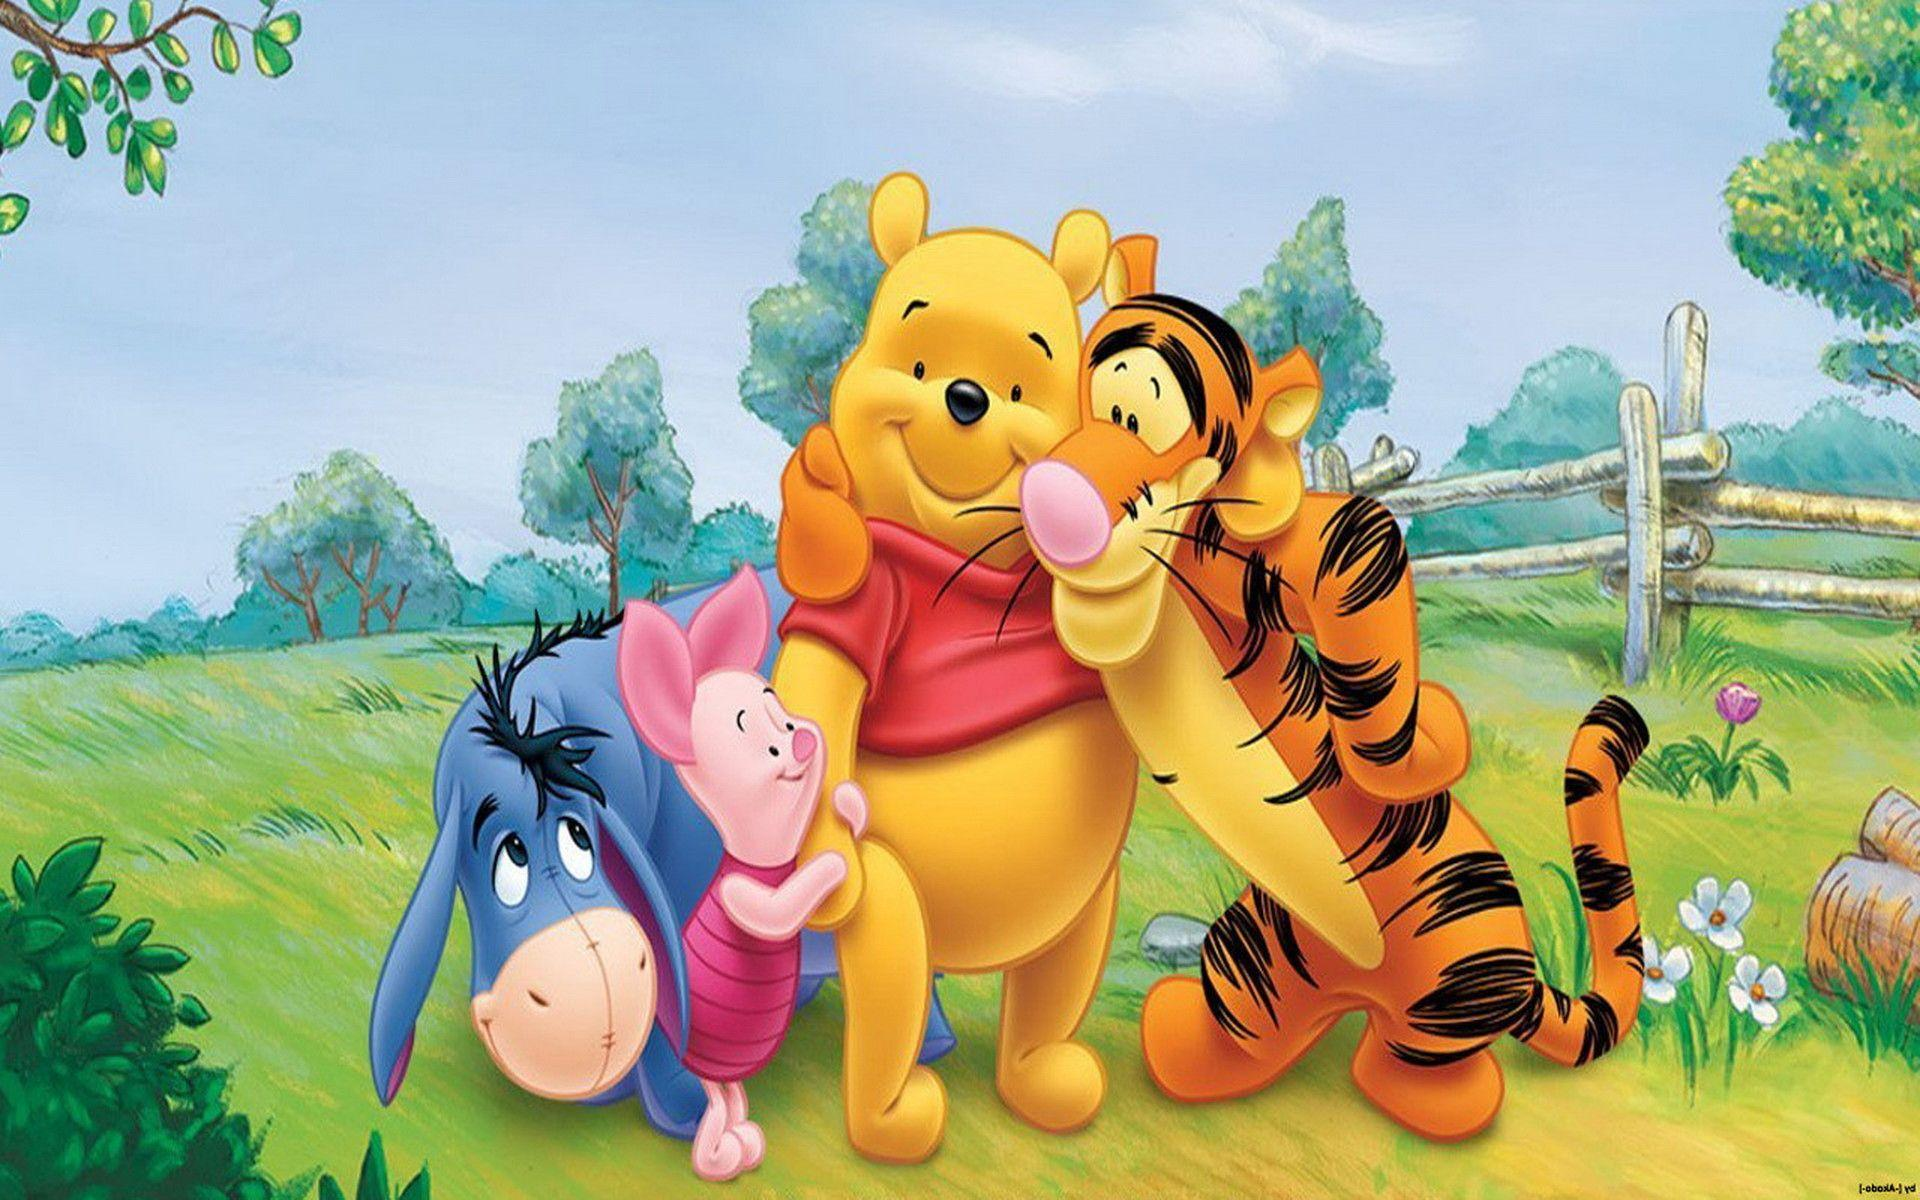 High Resolution Disney Wallpaper: Disney Cartoon HD Wallpapers For Desktop